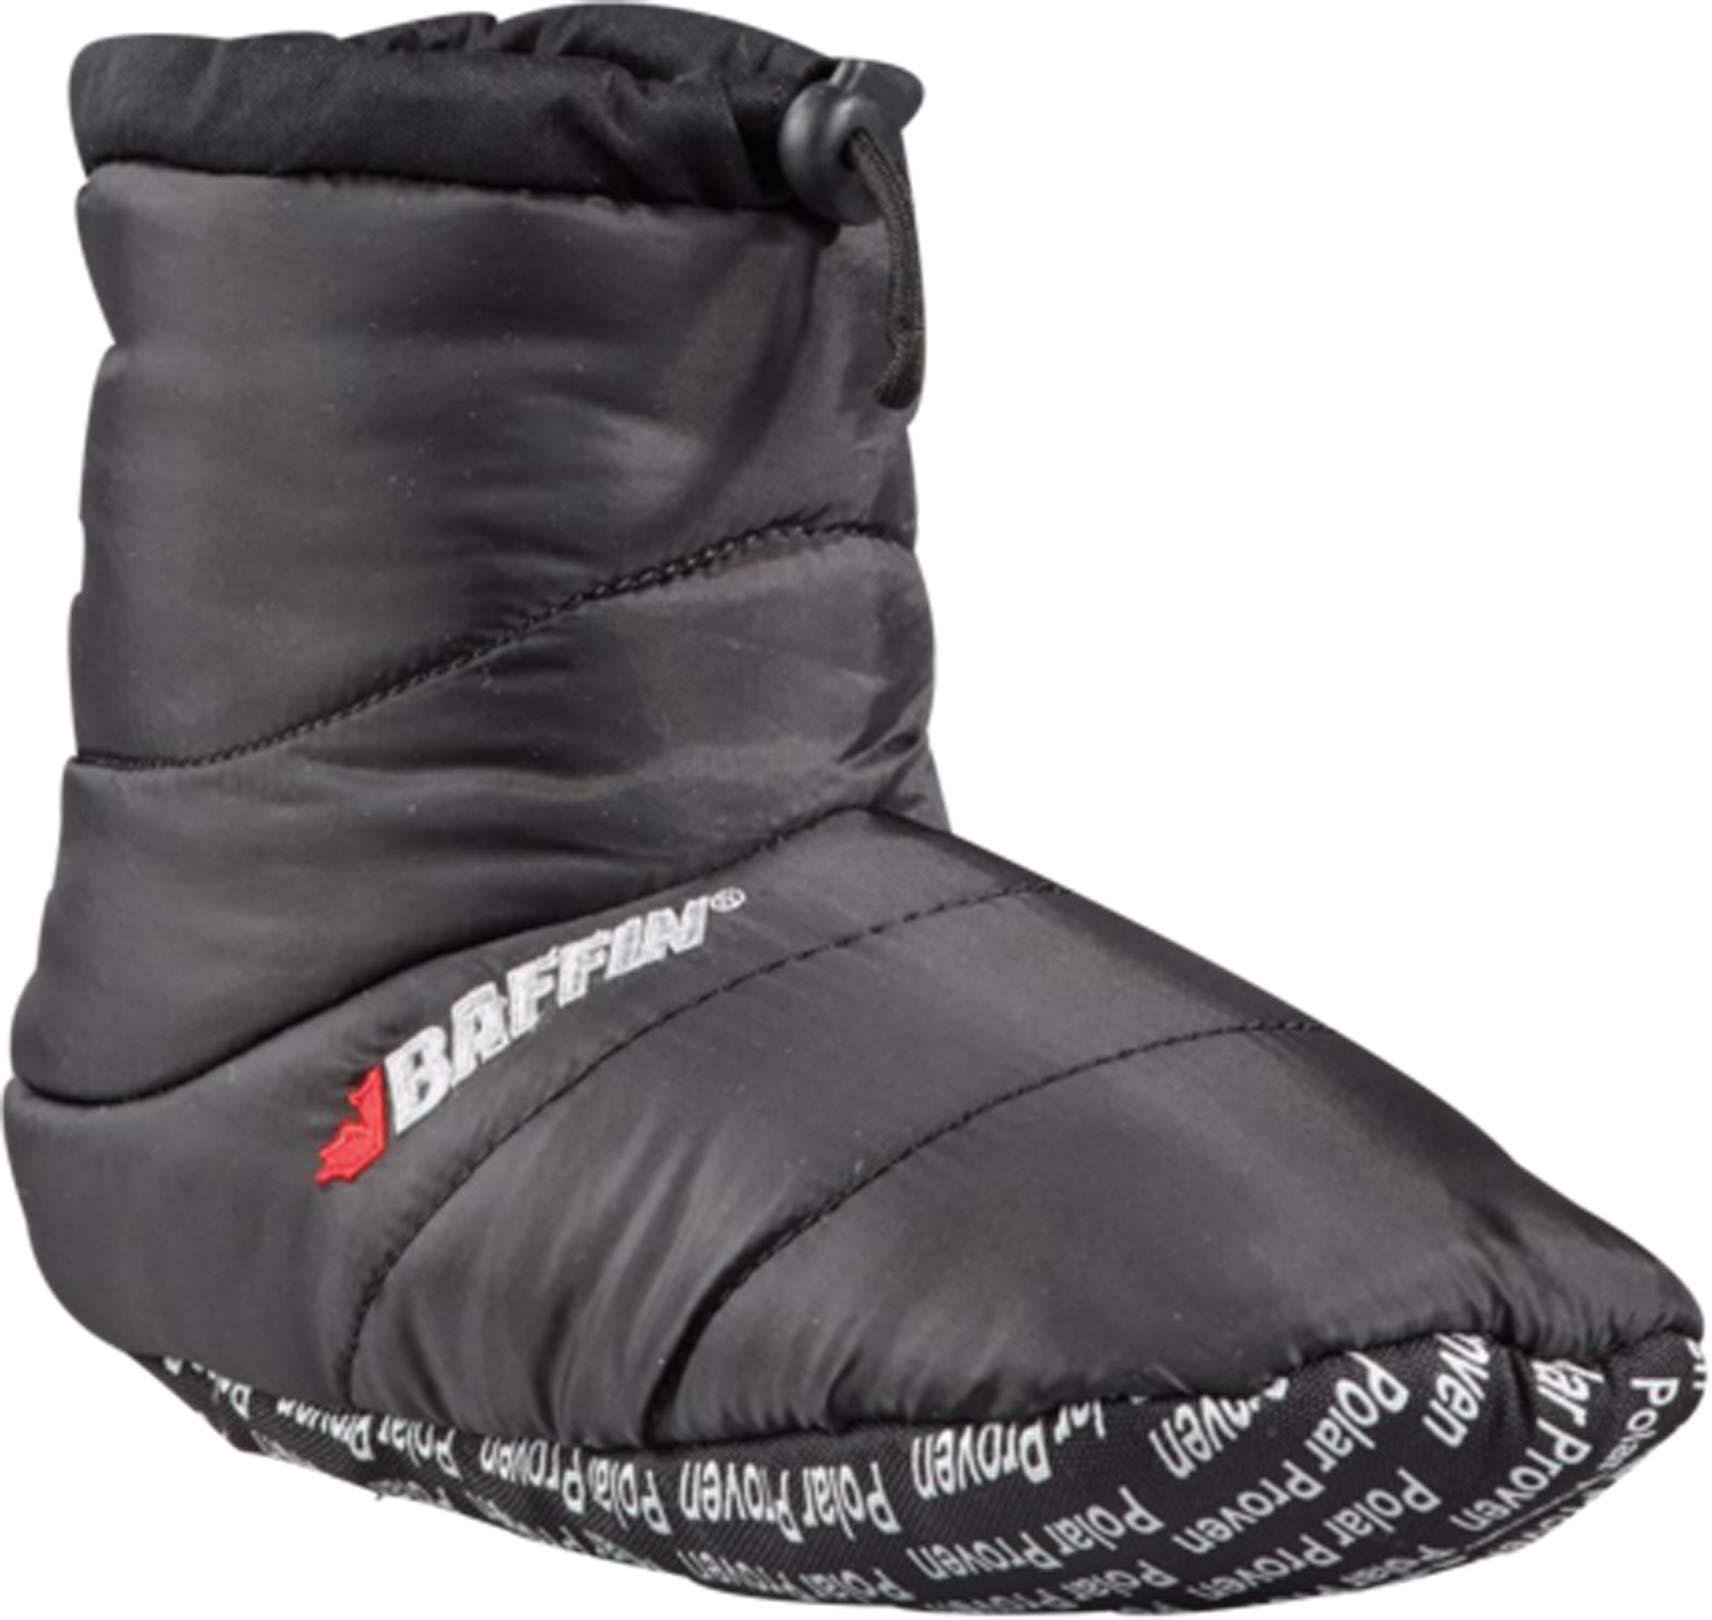 Baffin 61300000 Kid's Cush Booty Boot, Charcoal - YS